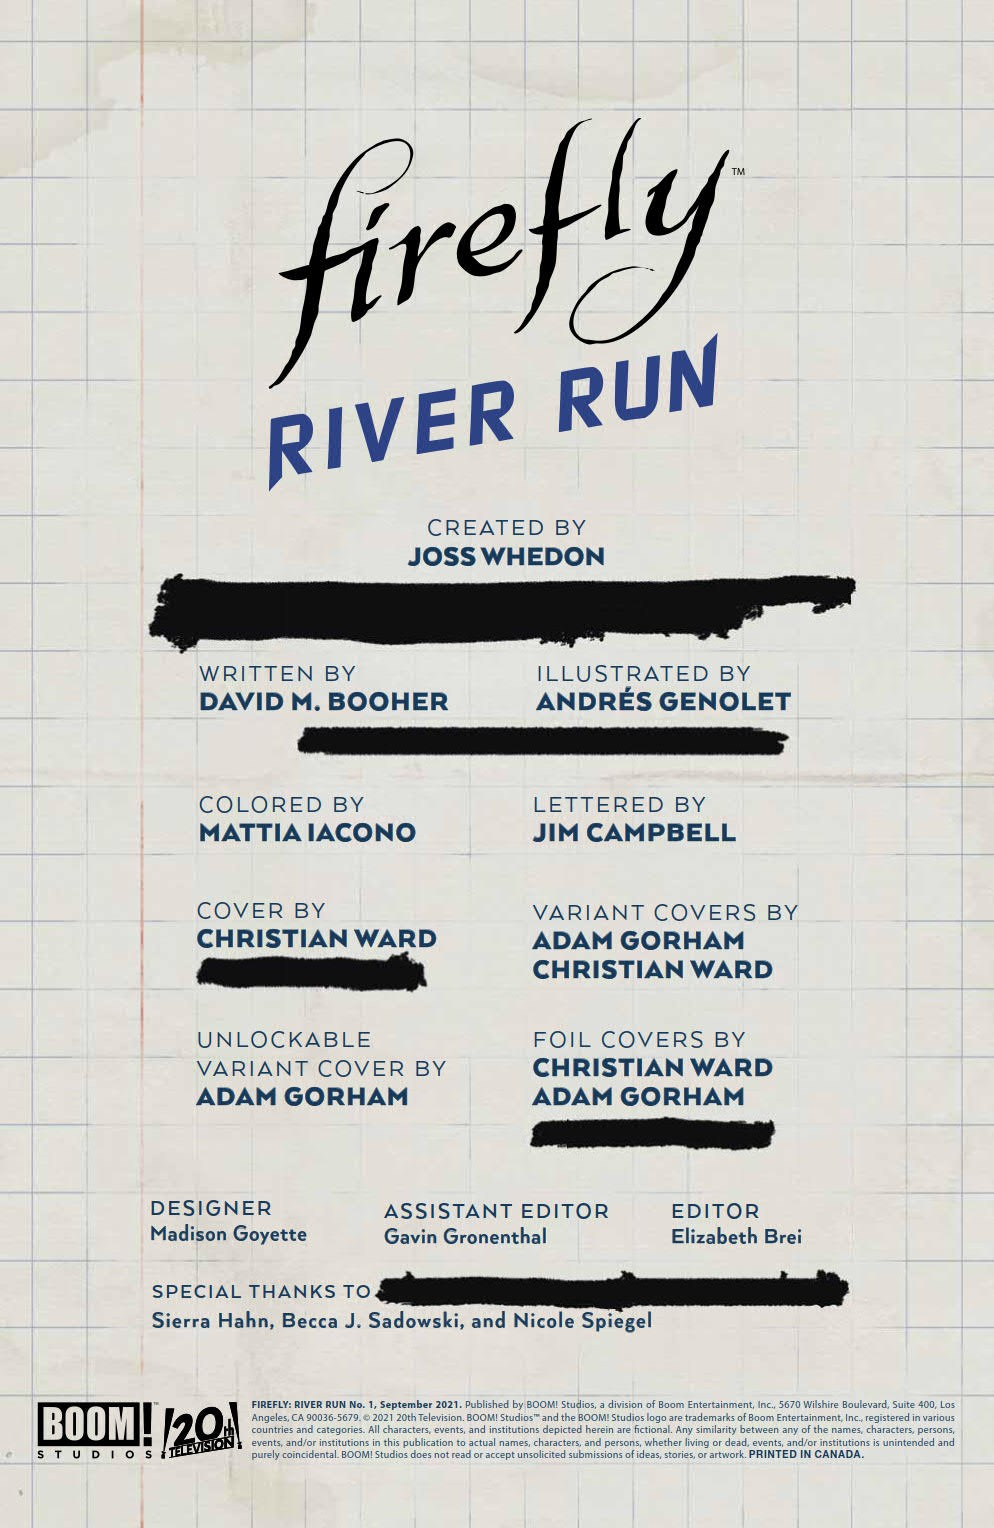 Firefly_RiverRun_001_PRESS_1 ComicList Previews: FIREFLY RIVER RUN #1